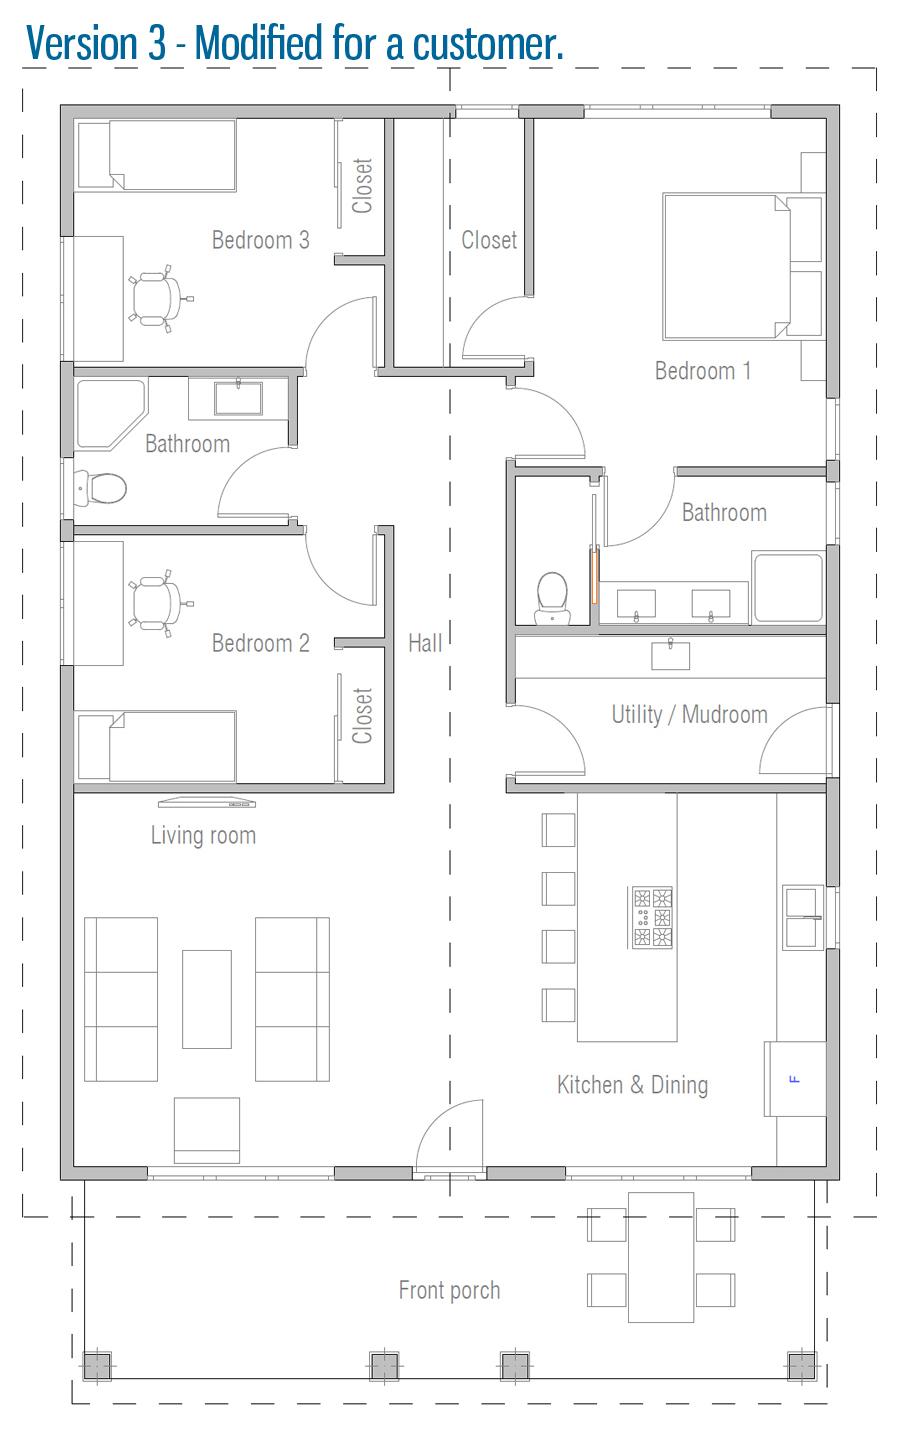 house-plans-2021_24_HOUSE_PLAN_CH671_V3.jpg